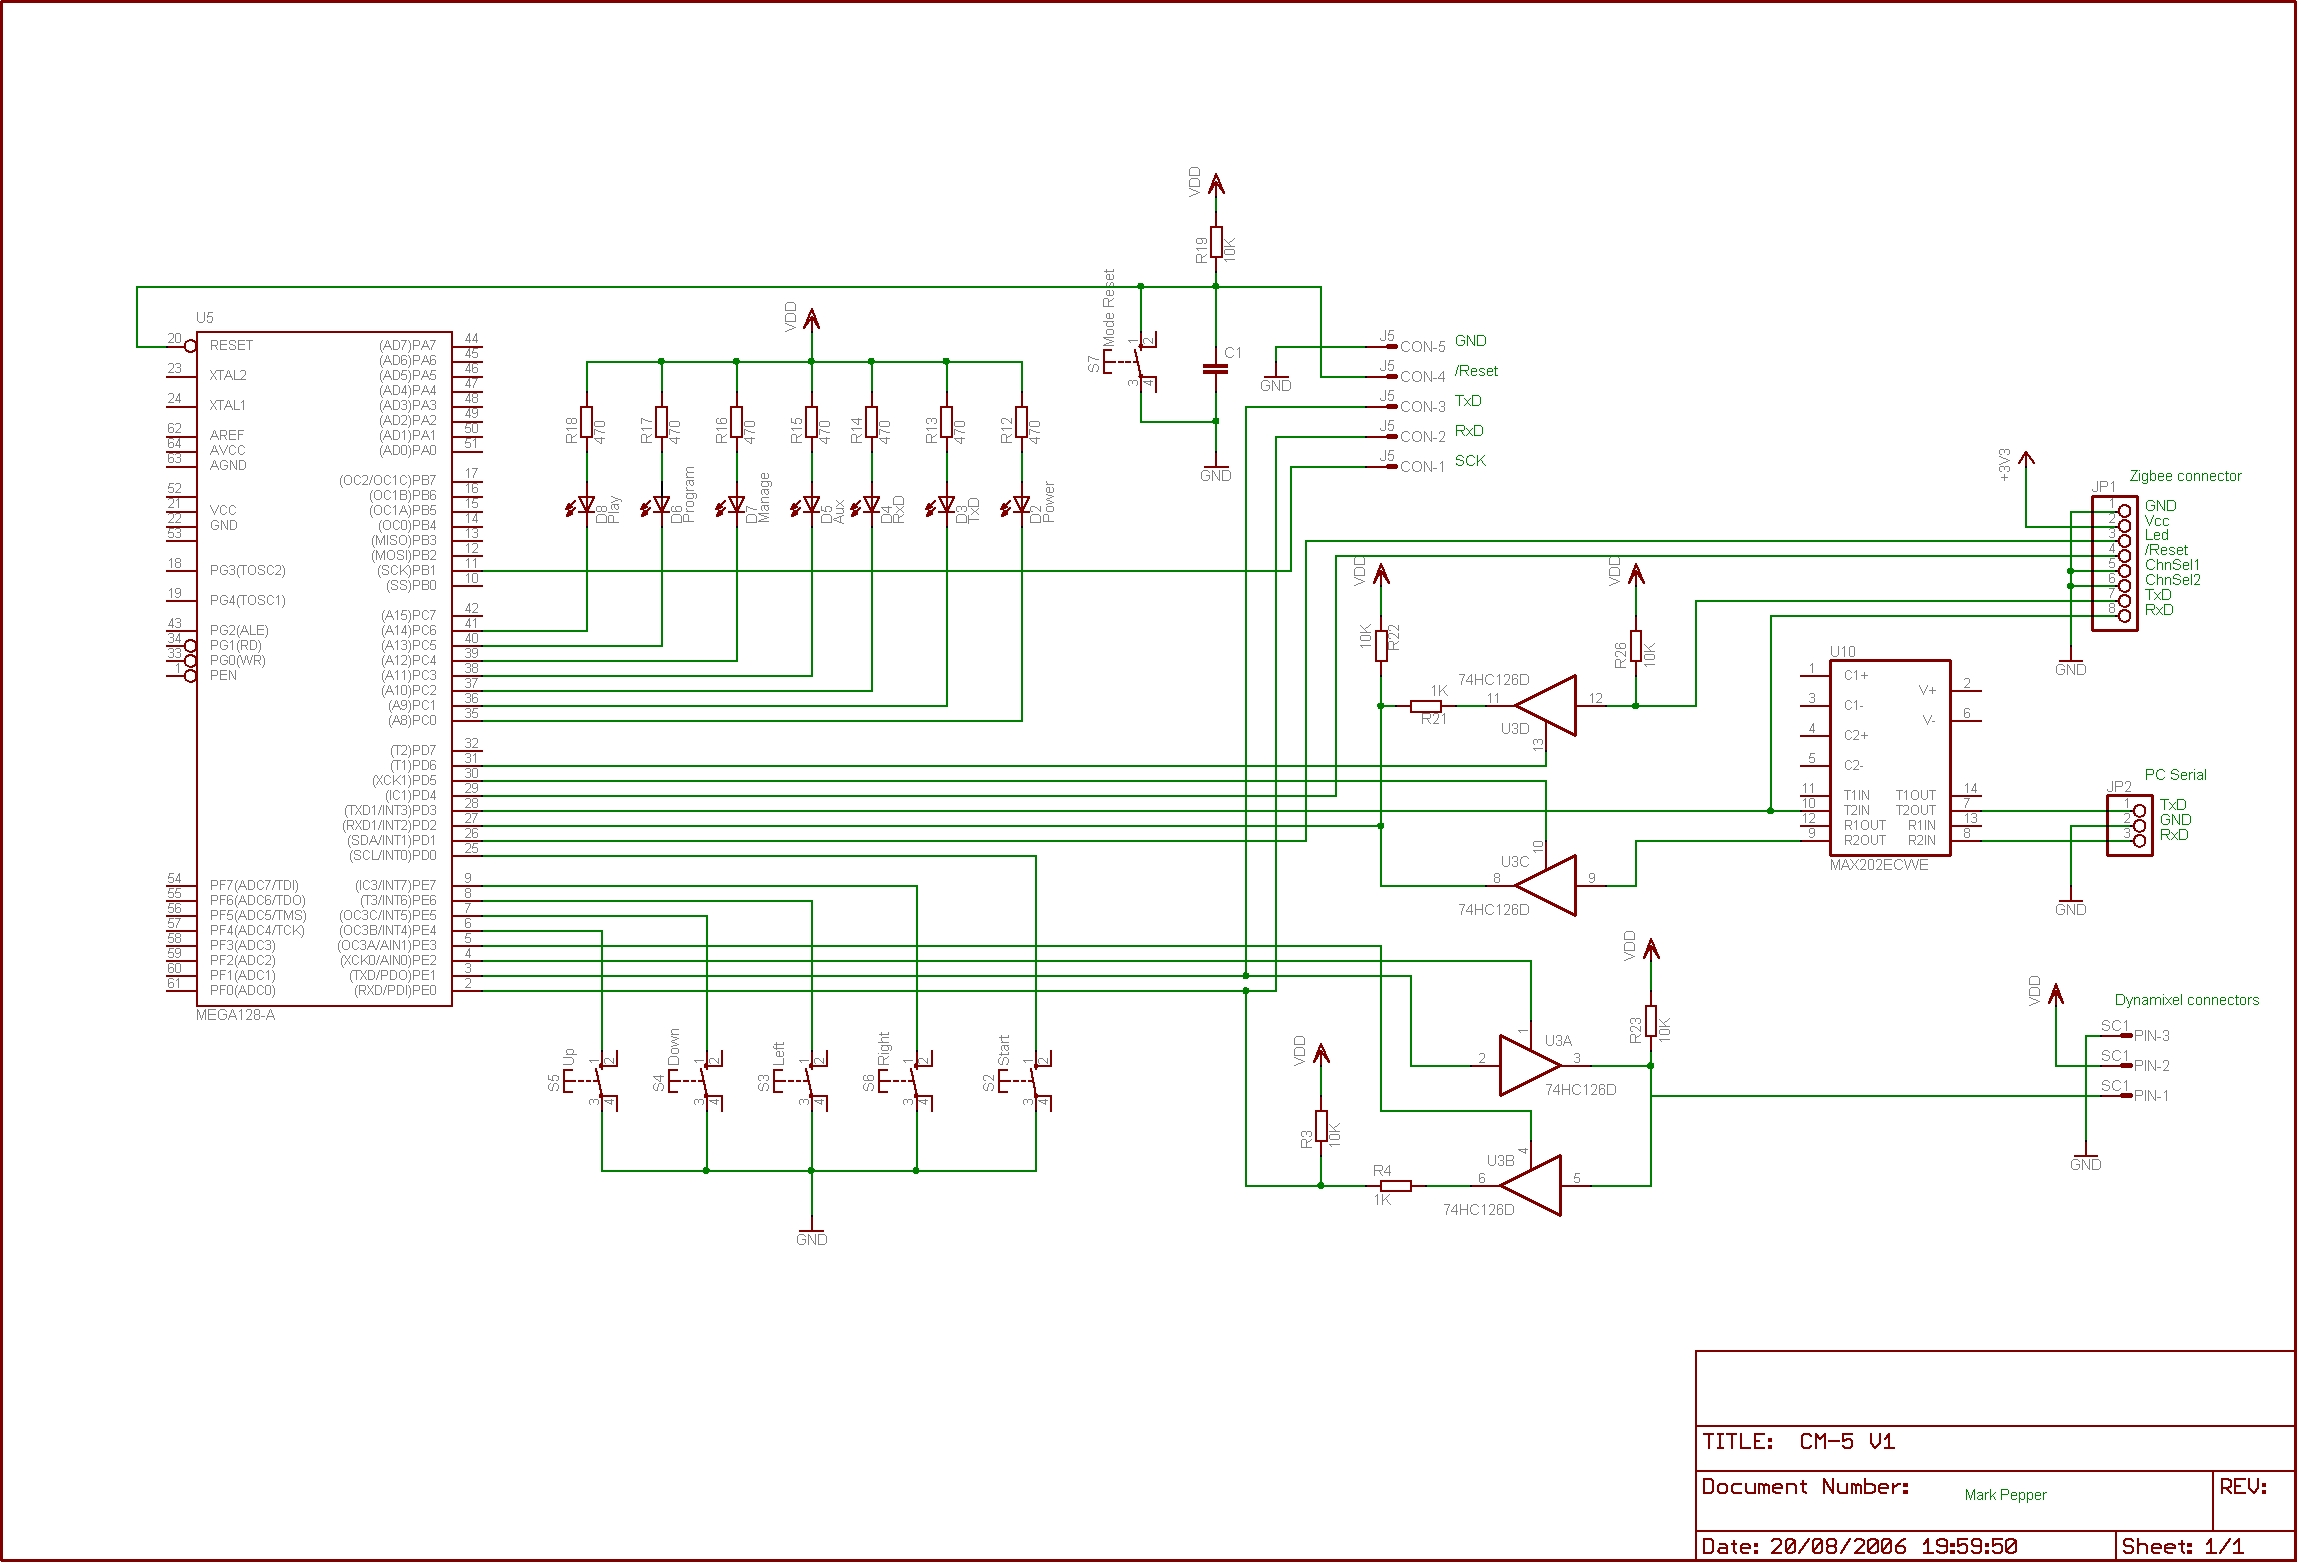 Cm5 Wiring Diagram Product Wiring Diagrams \u2022 CCM Wiring Diagrams Cm  Wiring Diagram B 28940